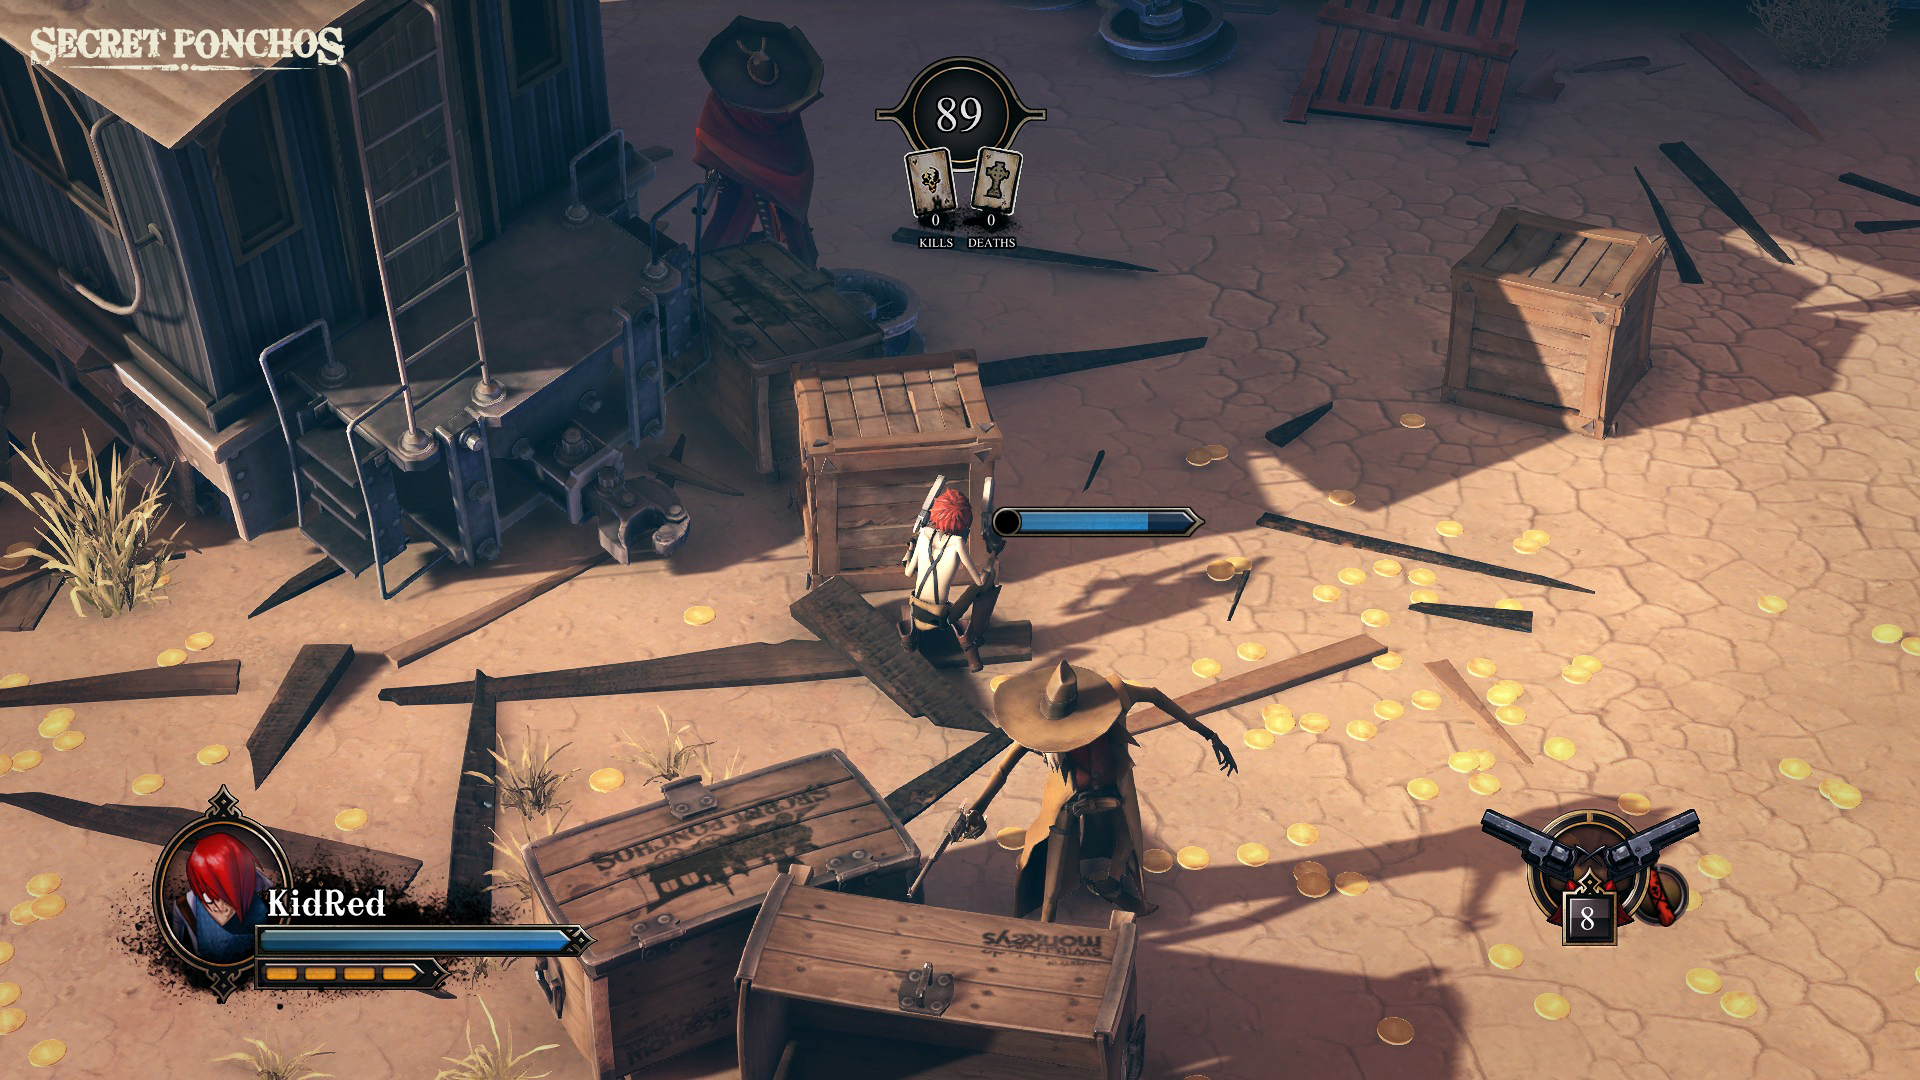 Secret Ponchos - Wild West isometric action MP gunfights